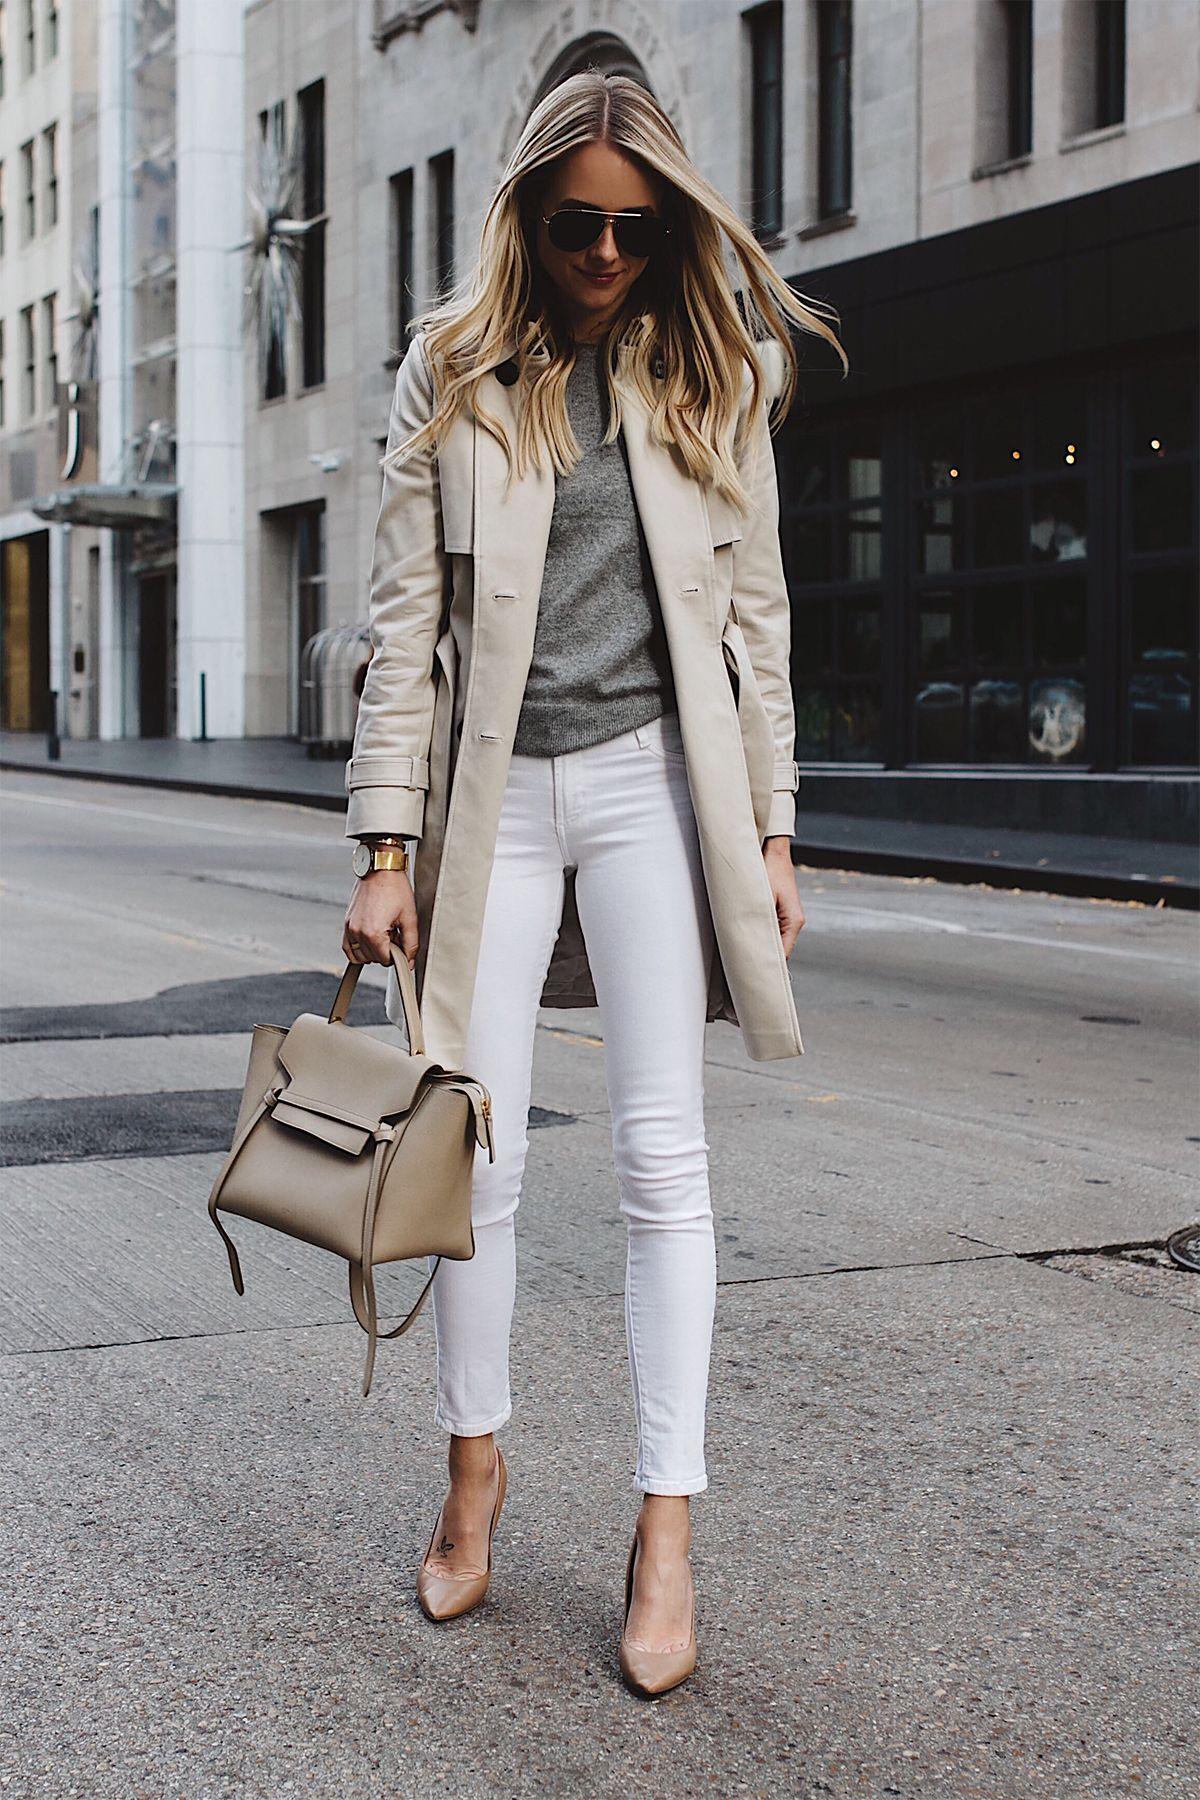 987ba05eac3 Fashion Jackson Club Monaco Trench Coat Grey Sweater White Skinny Jeans  Celine Belt Bag Aviator Sunglasses Nude Pumps Fashion Jackson Dallas Blogger  Fashion ...